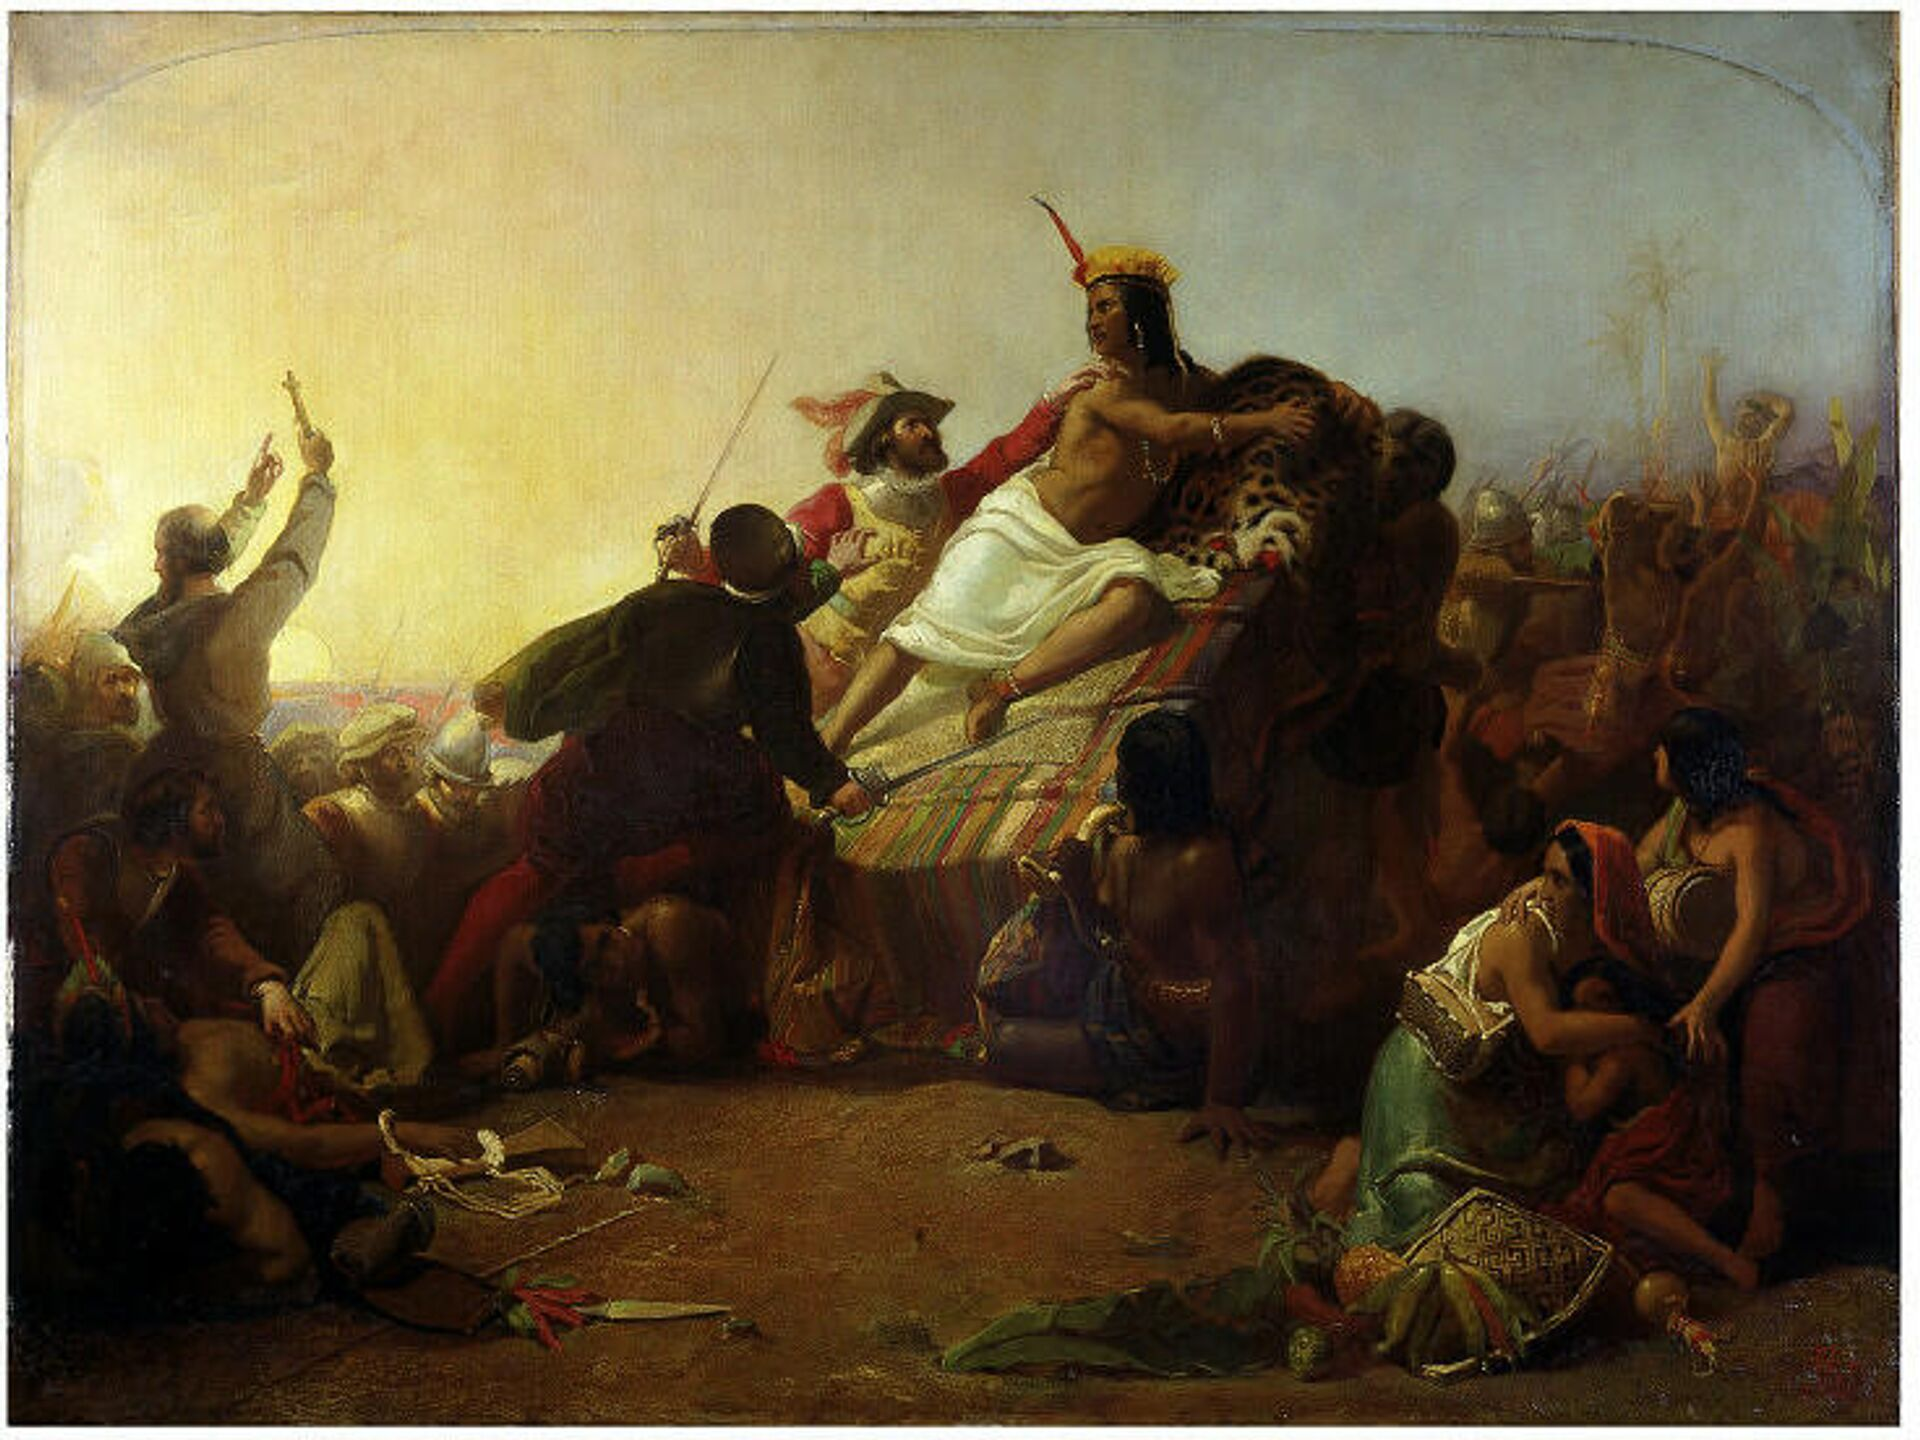 Картина Писарро берёт в плен Инку Атауальпу (1845) - ПРОФИ Новости, 1920, 23.07.2021